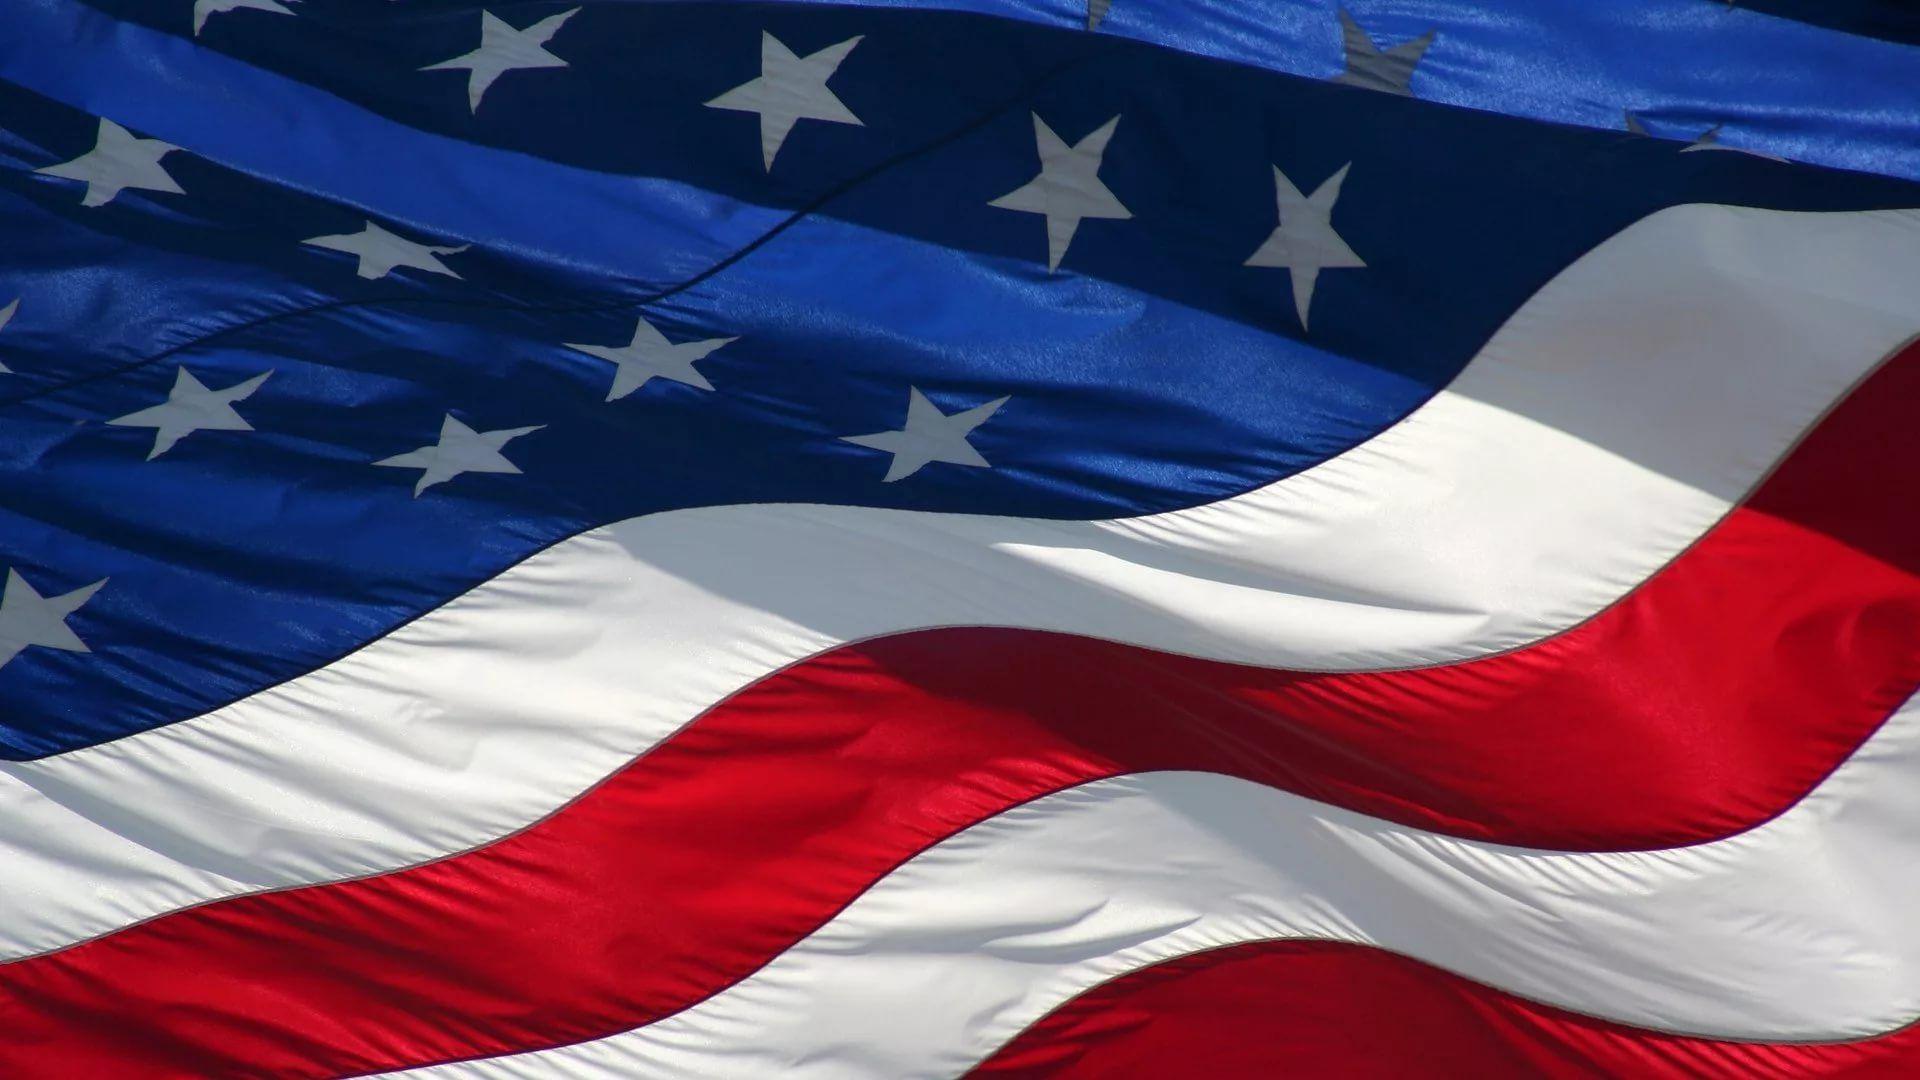 America Flag background wallpaper